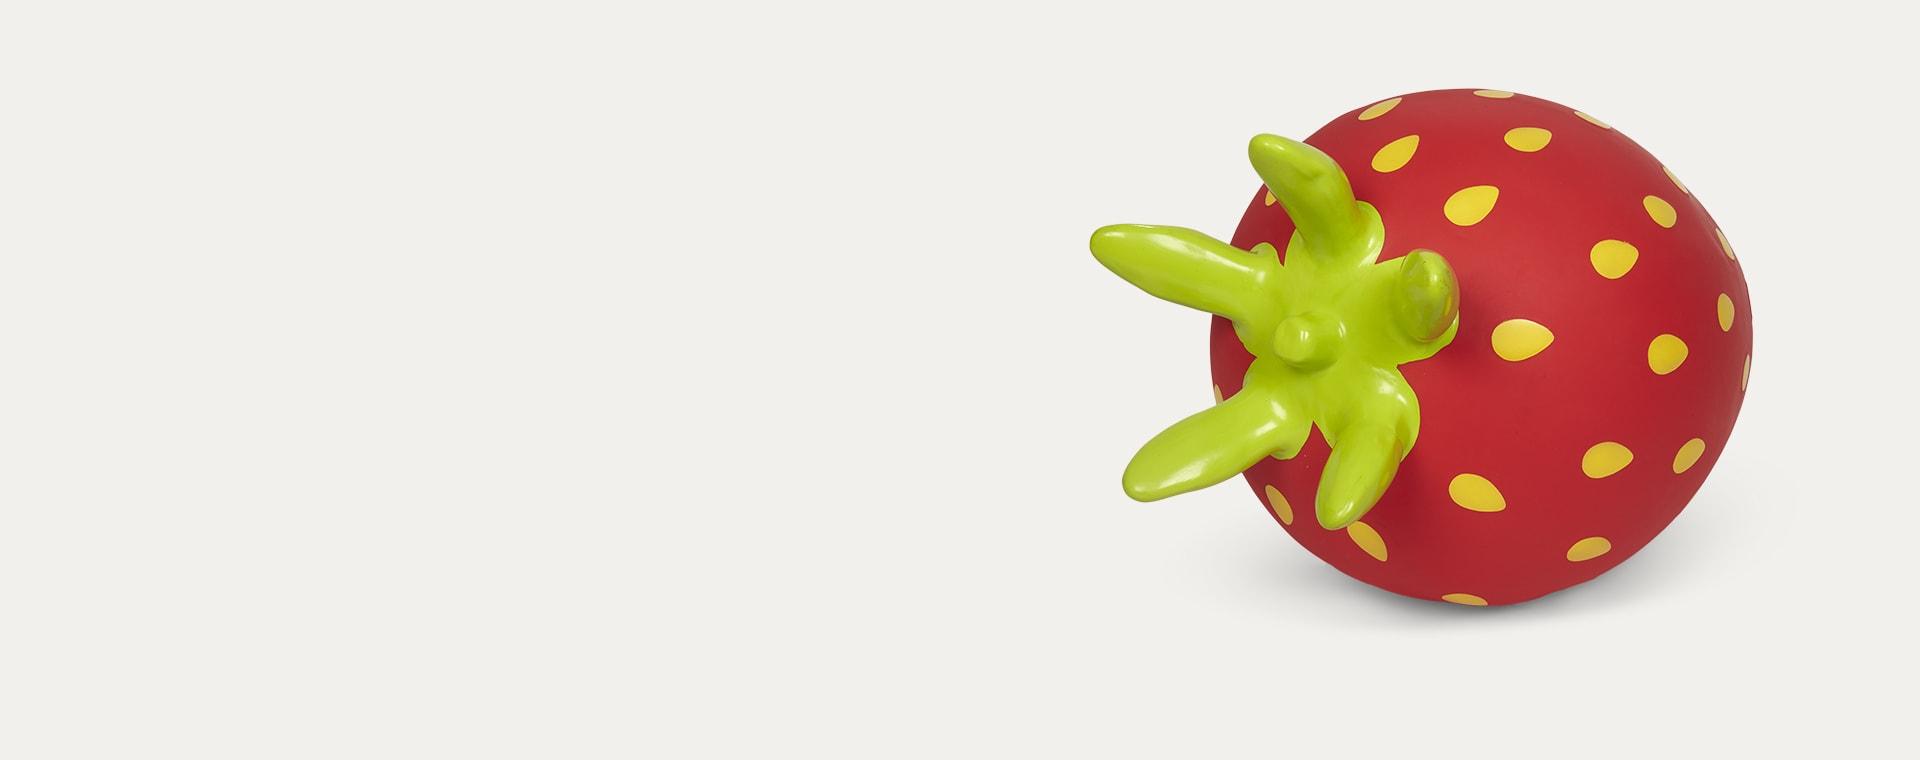 Red Gerardo's Toys Strawberry Jumpy Fruit